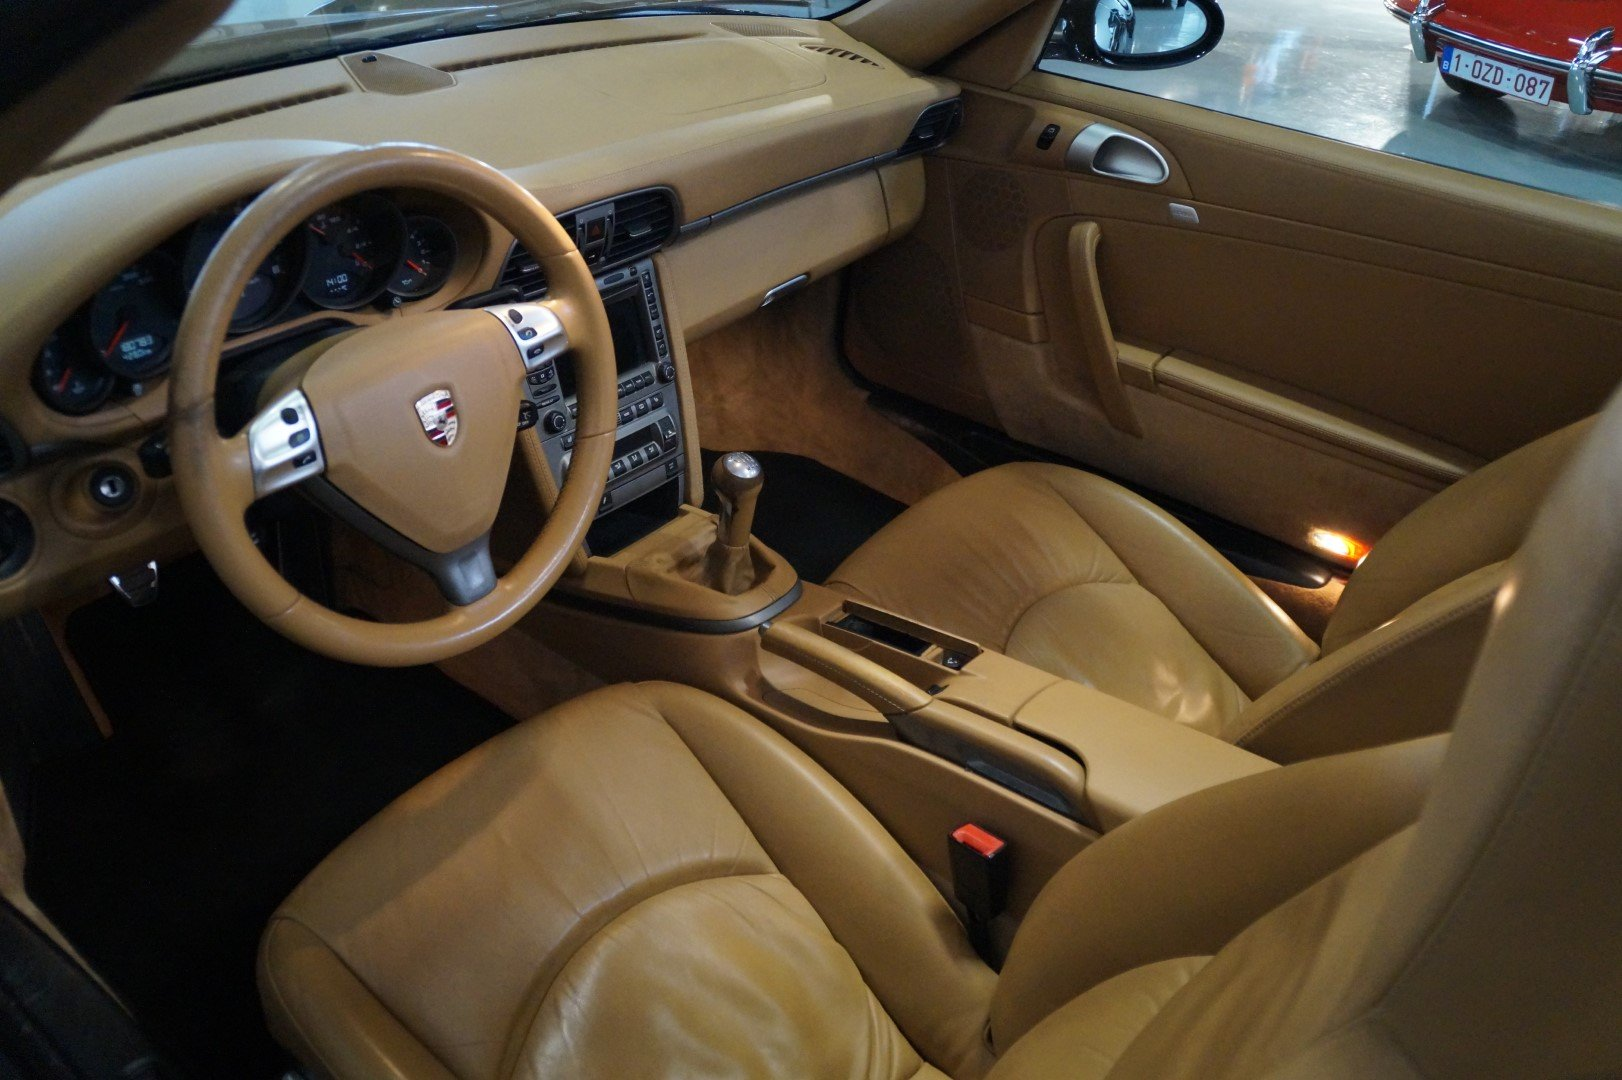 PORSCHE 911 997 Carrera 2 Convertible MANUAL!!! (2006) For Sale (picture 3 of 6)